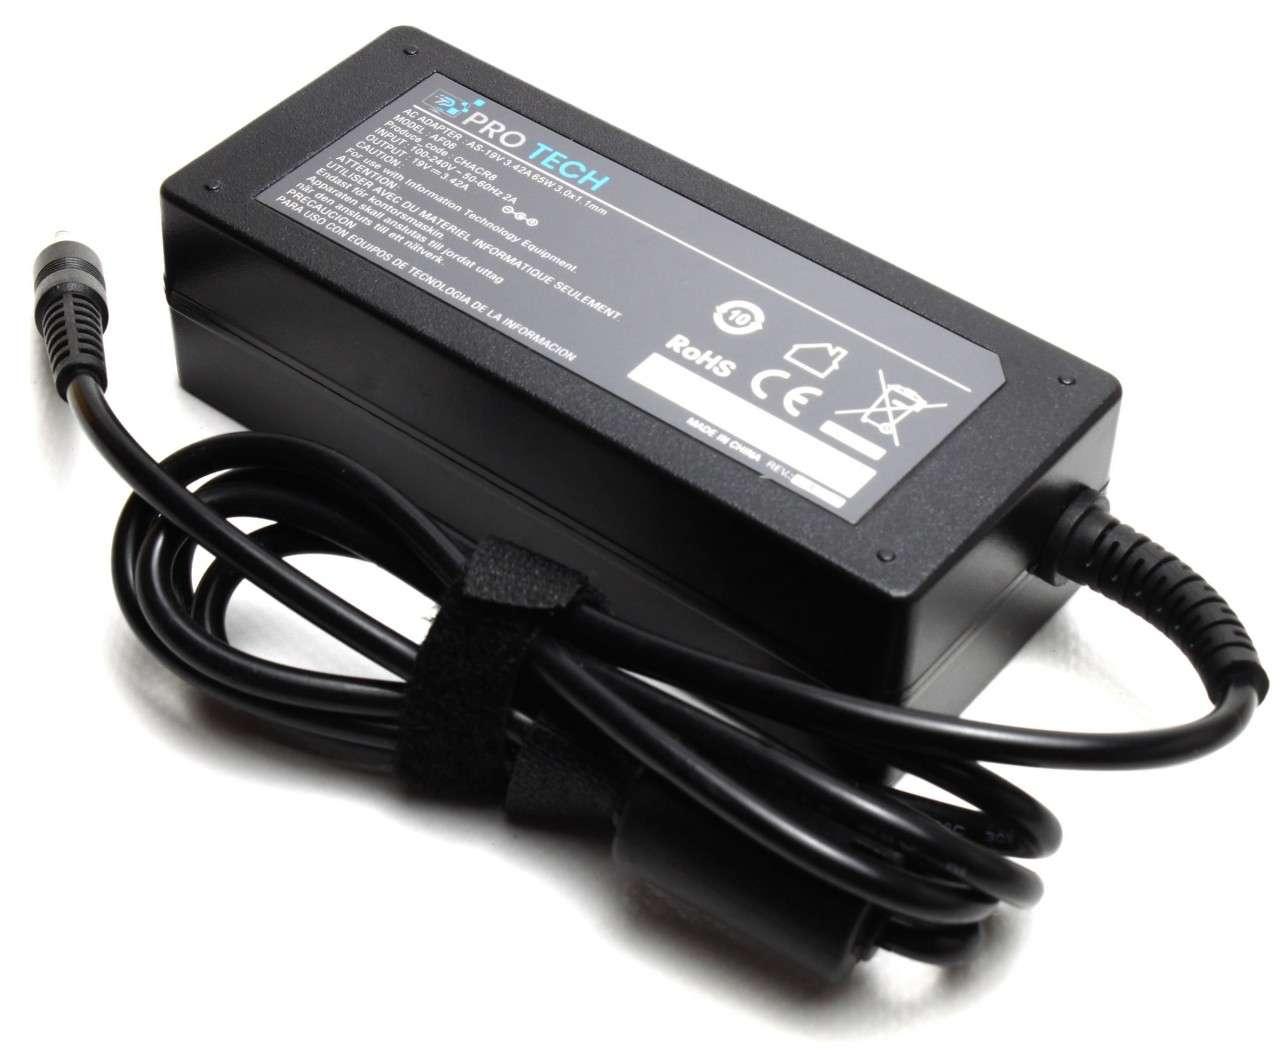 Incarcator Acer Aspire S7 191 6640 65W Replacement imagine powerlaptop.ro 2021